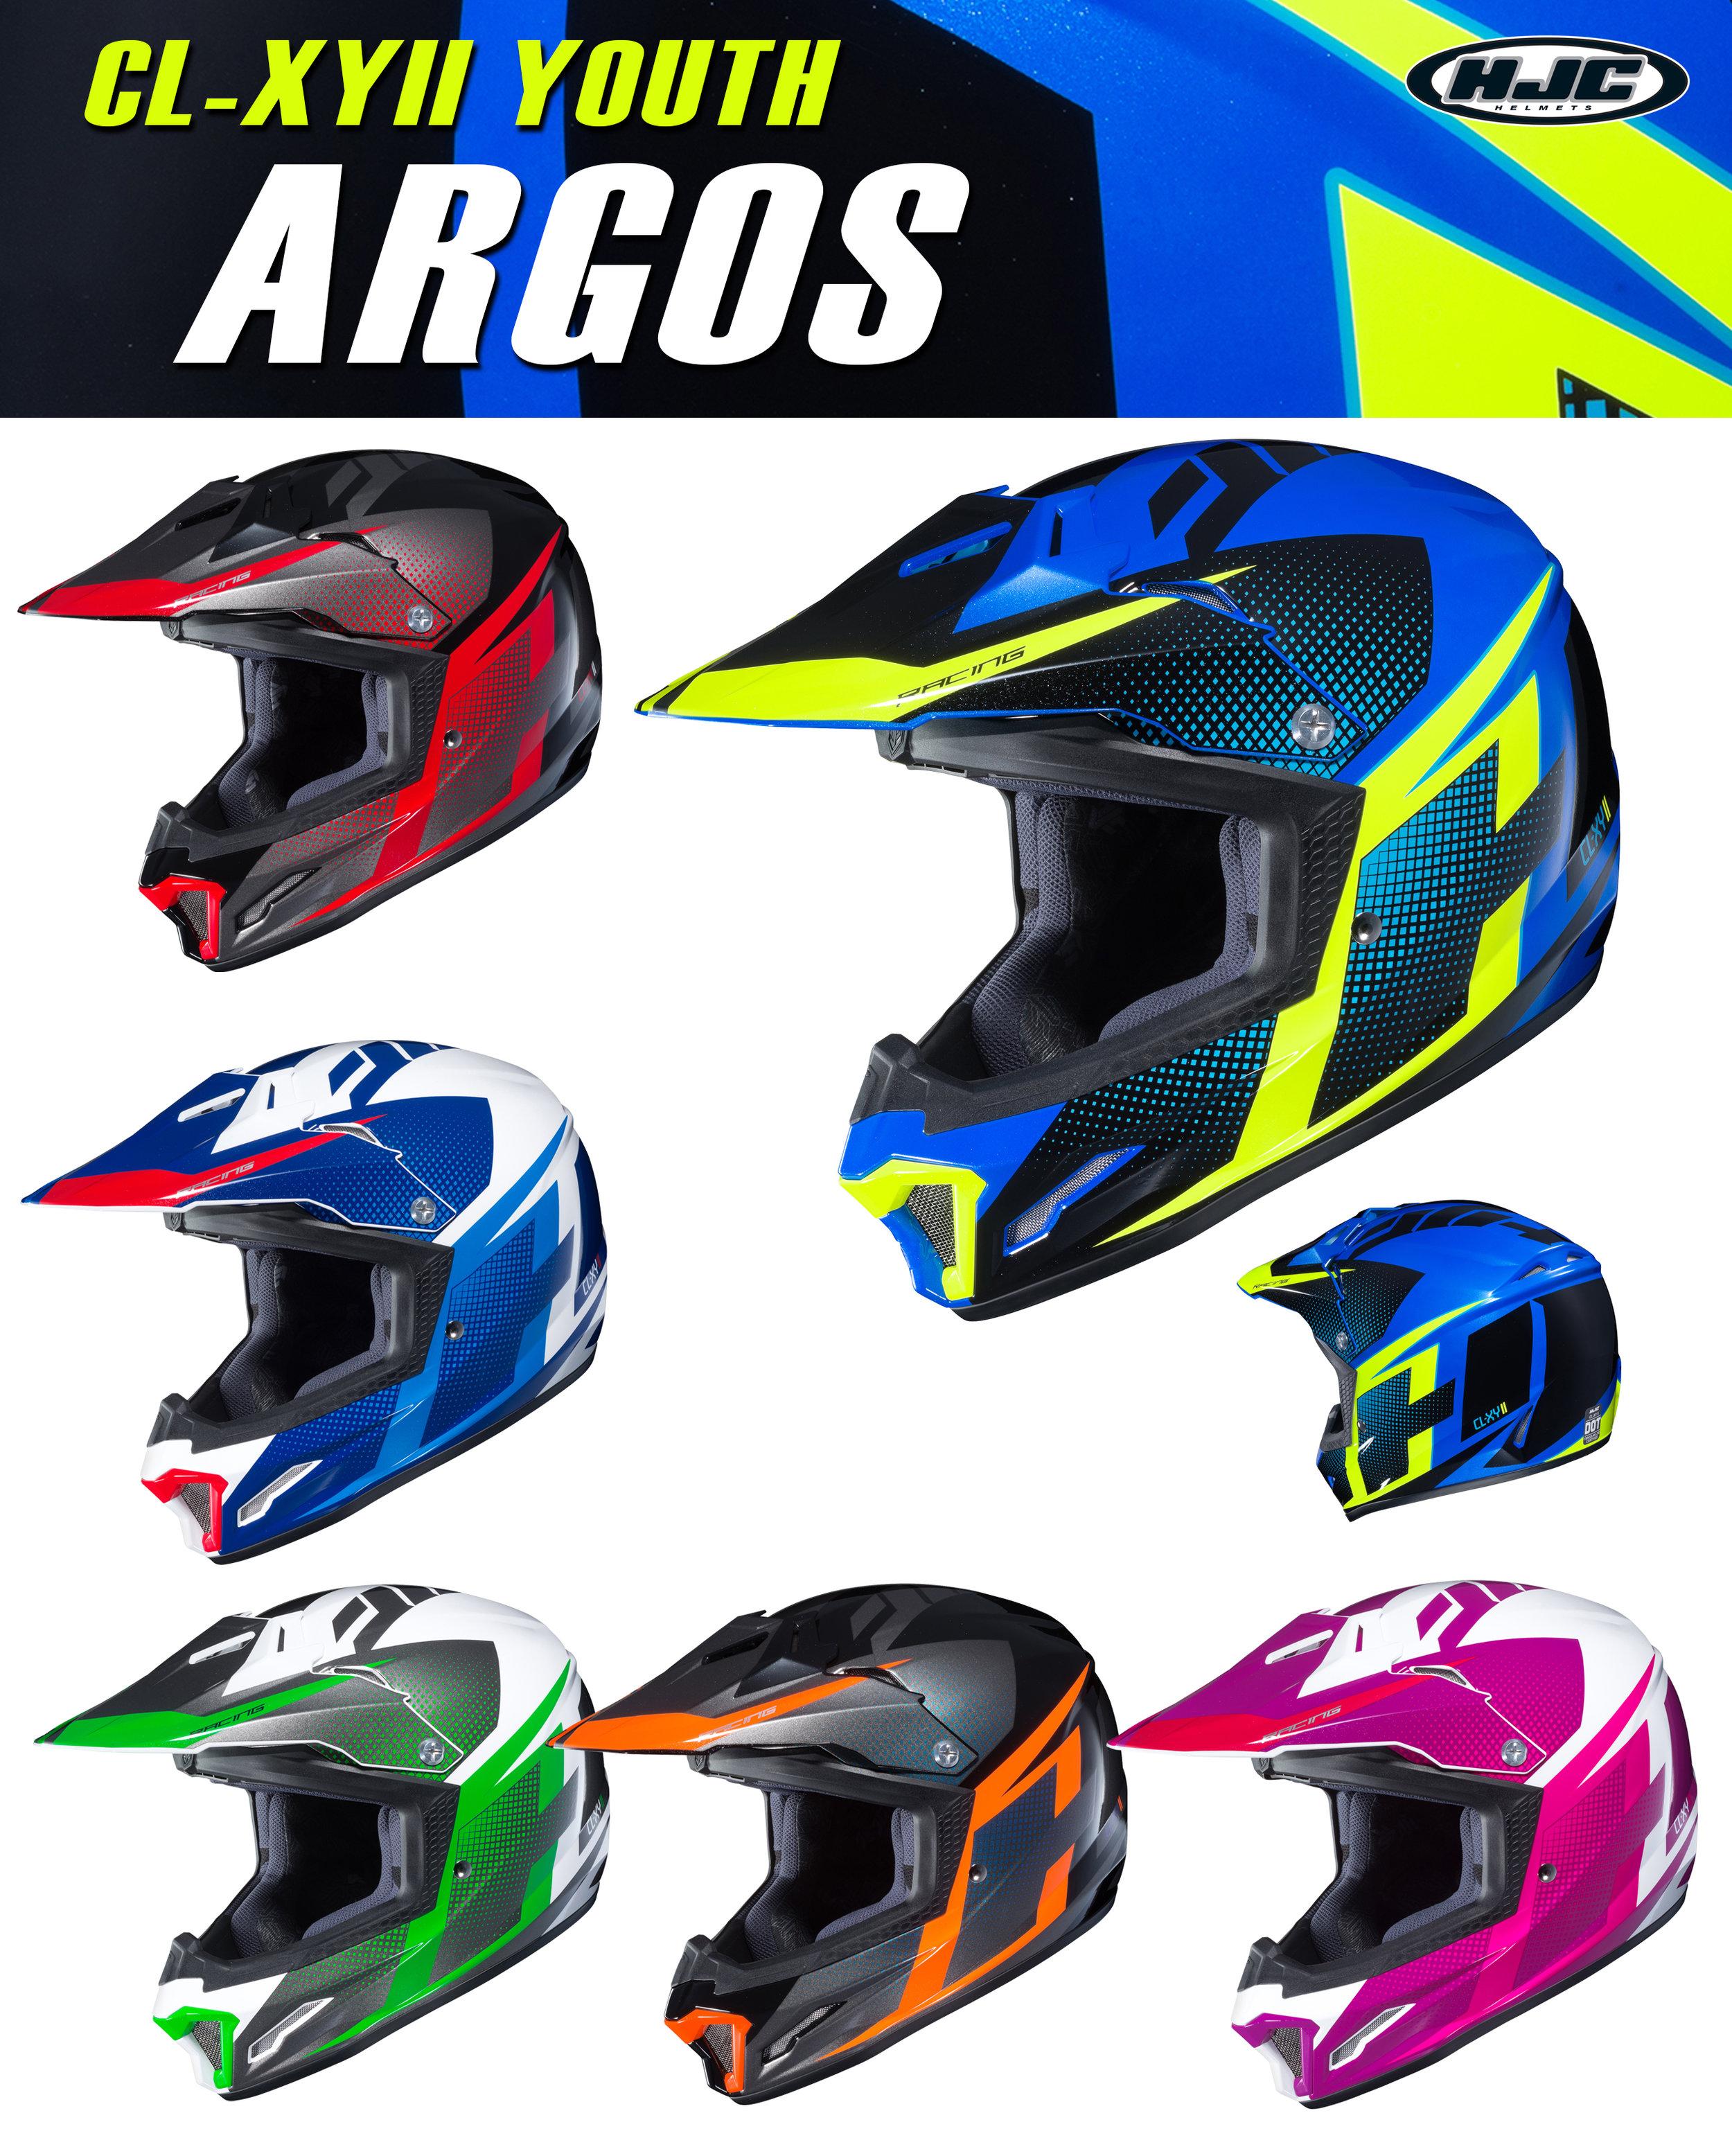 CLXYII ARGOS Helmet Post.jpg